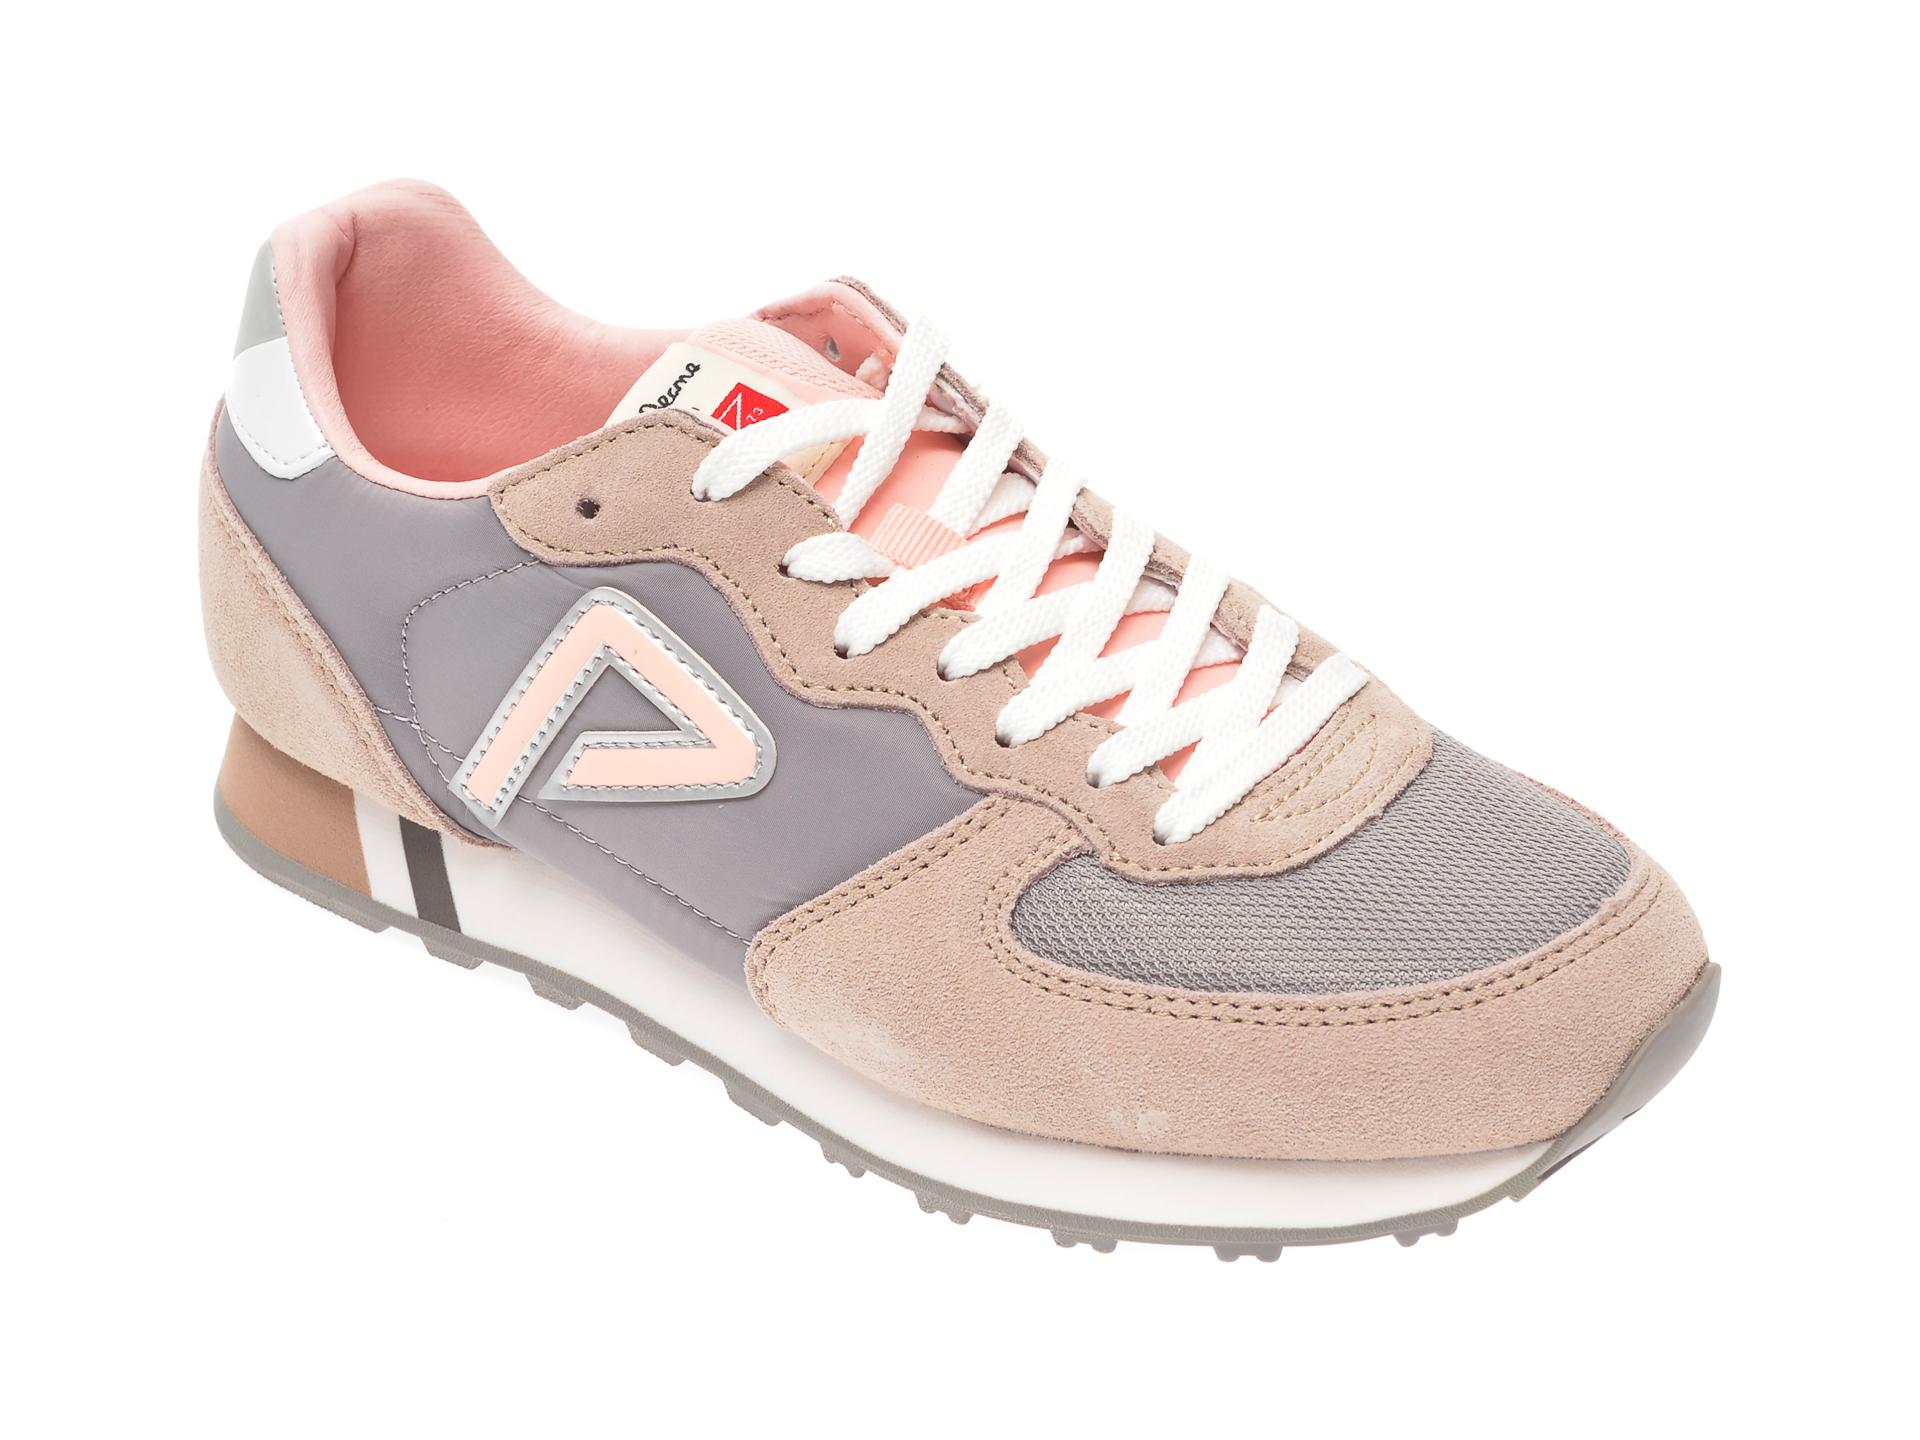 Pantofi sport PEPE JEANS roz, LS31004, din material textil si piele intoarsa